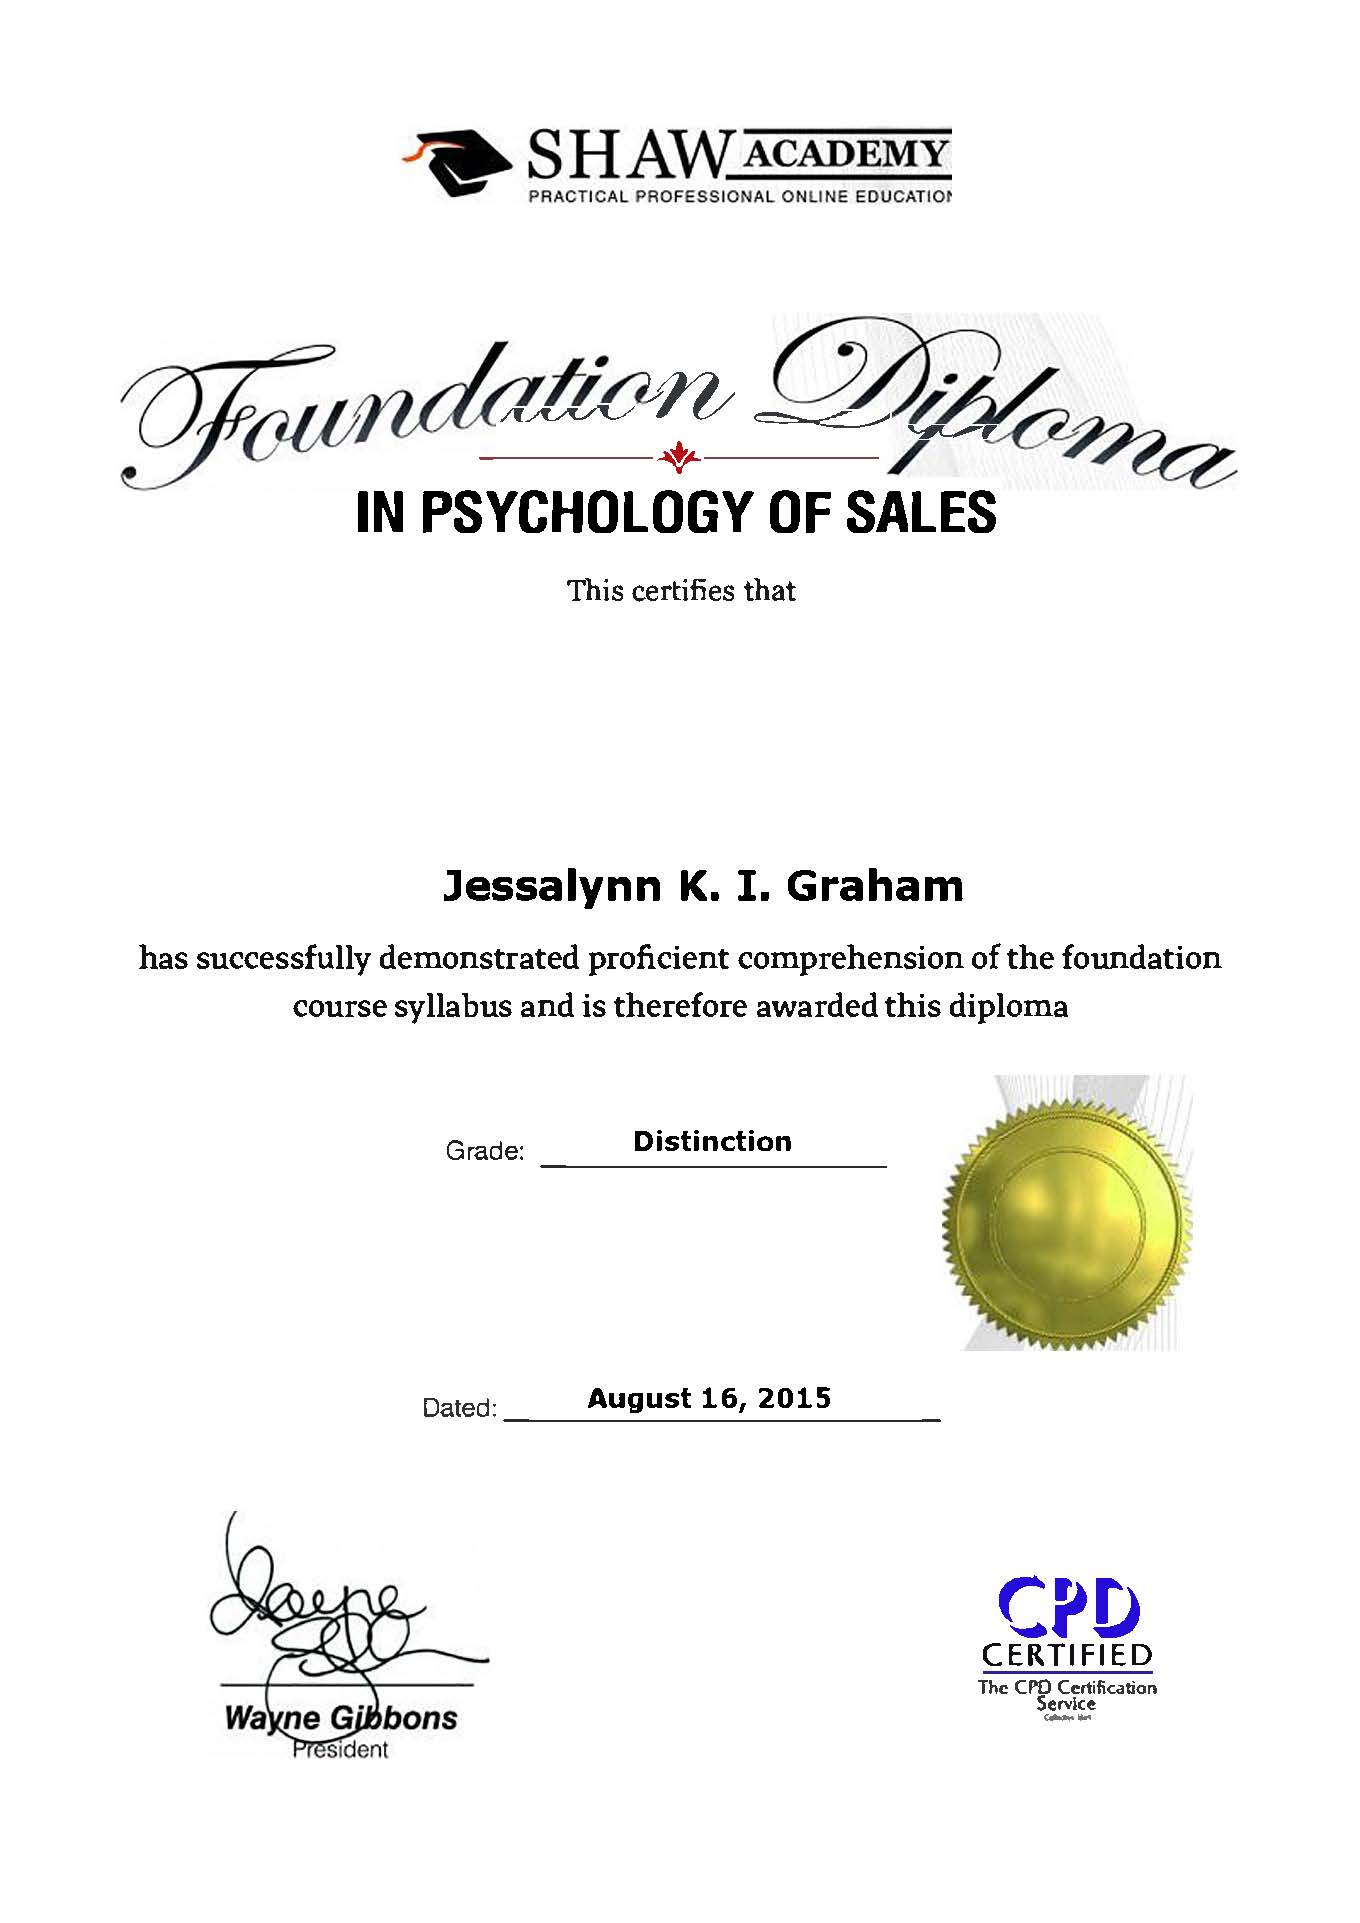 Psychology of Sales Diploma